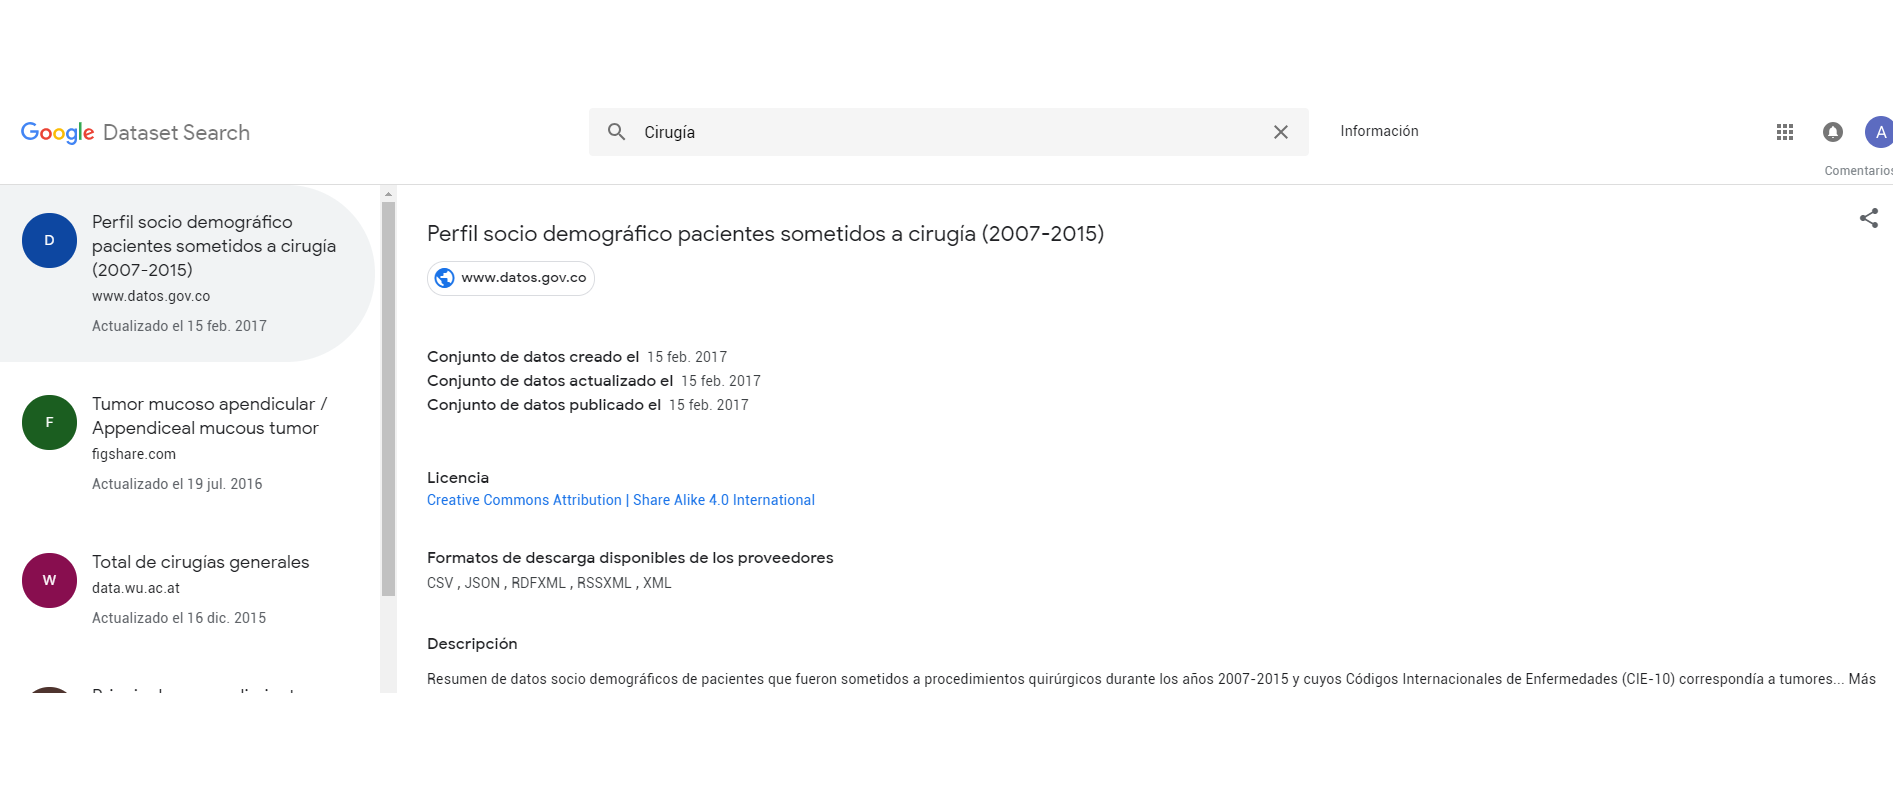 Dataset Search Uso de Metadatos